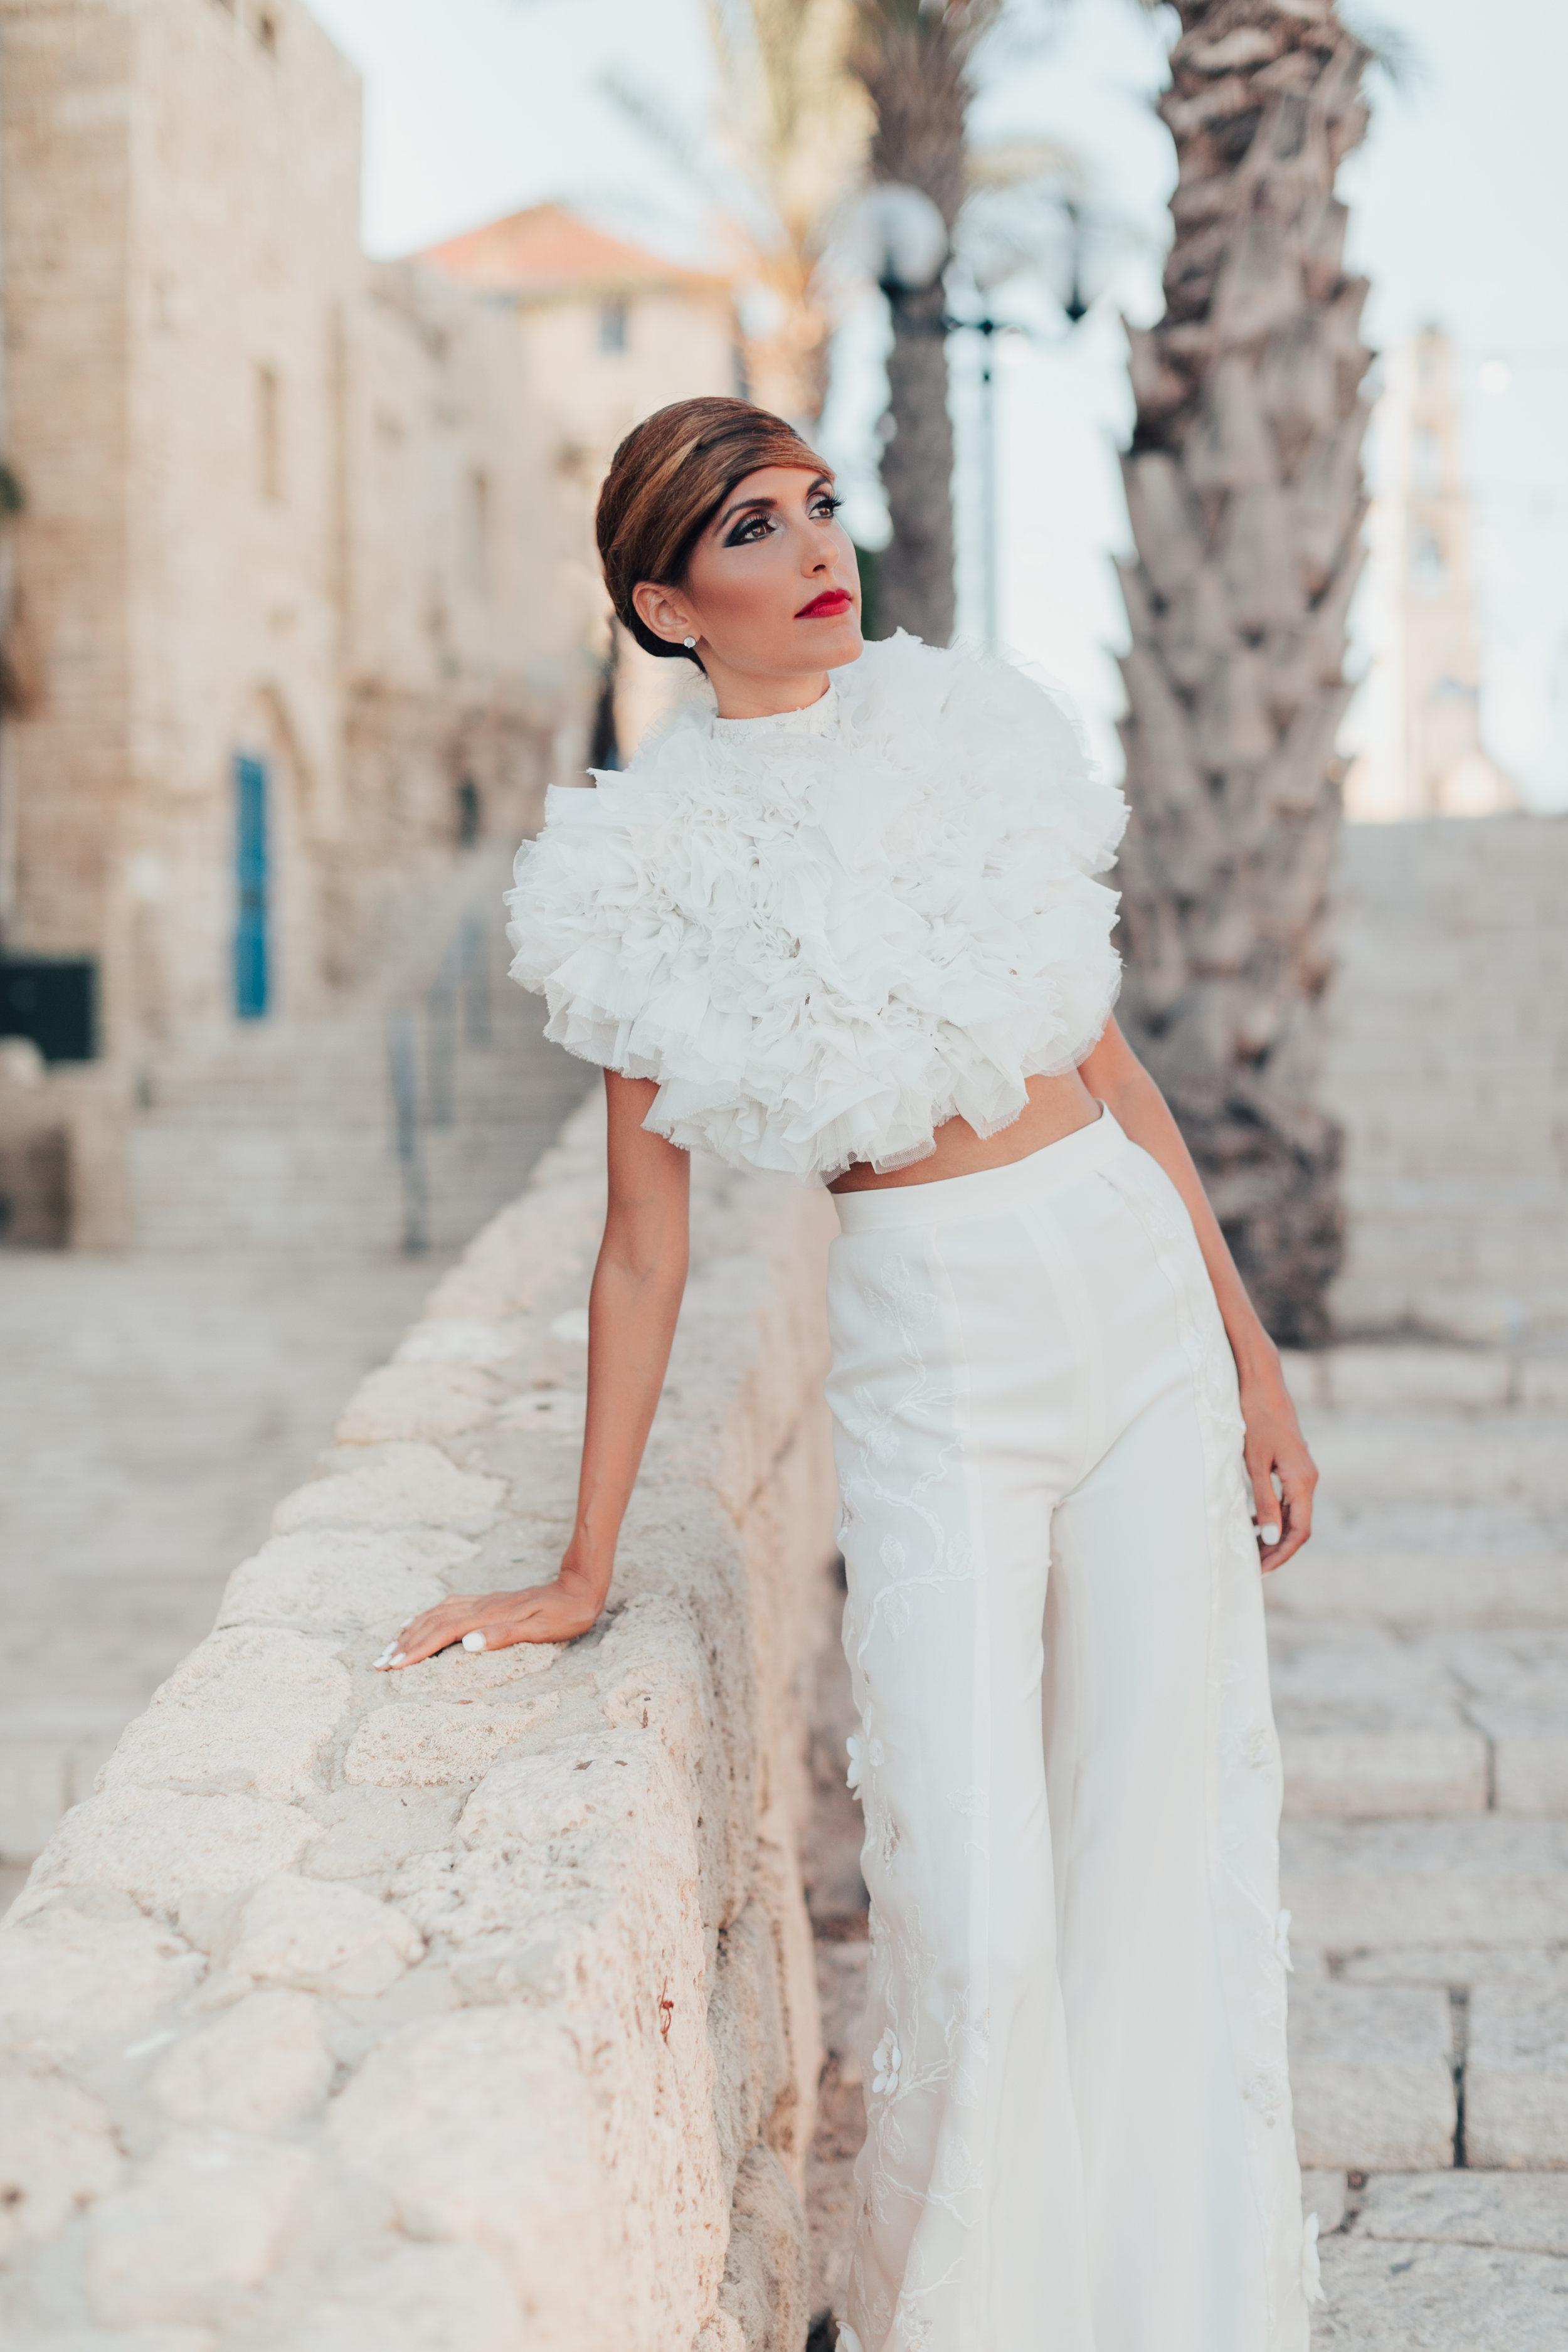 Anée Atelier Israel Nathalie Kraynina Bride 4